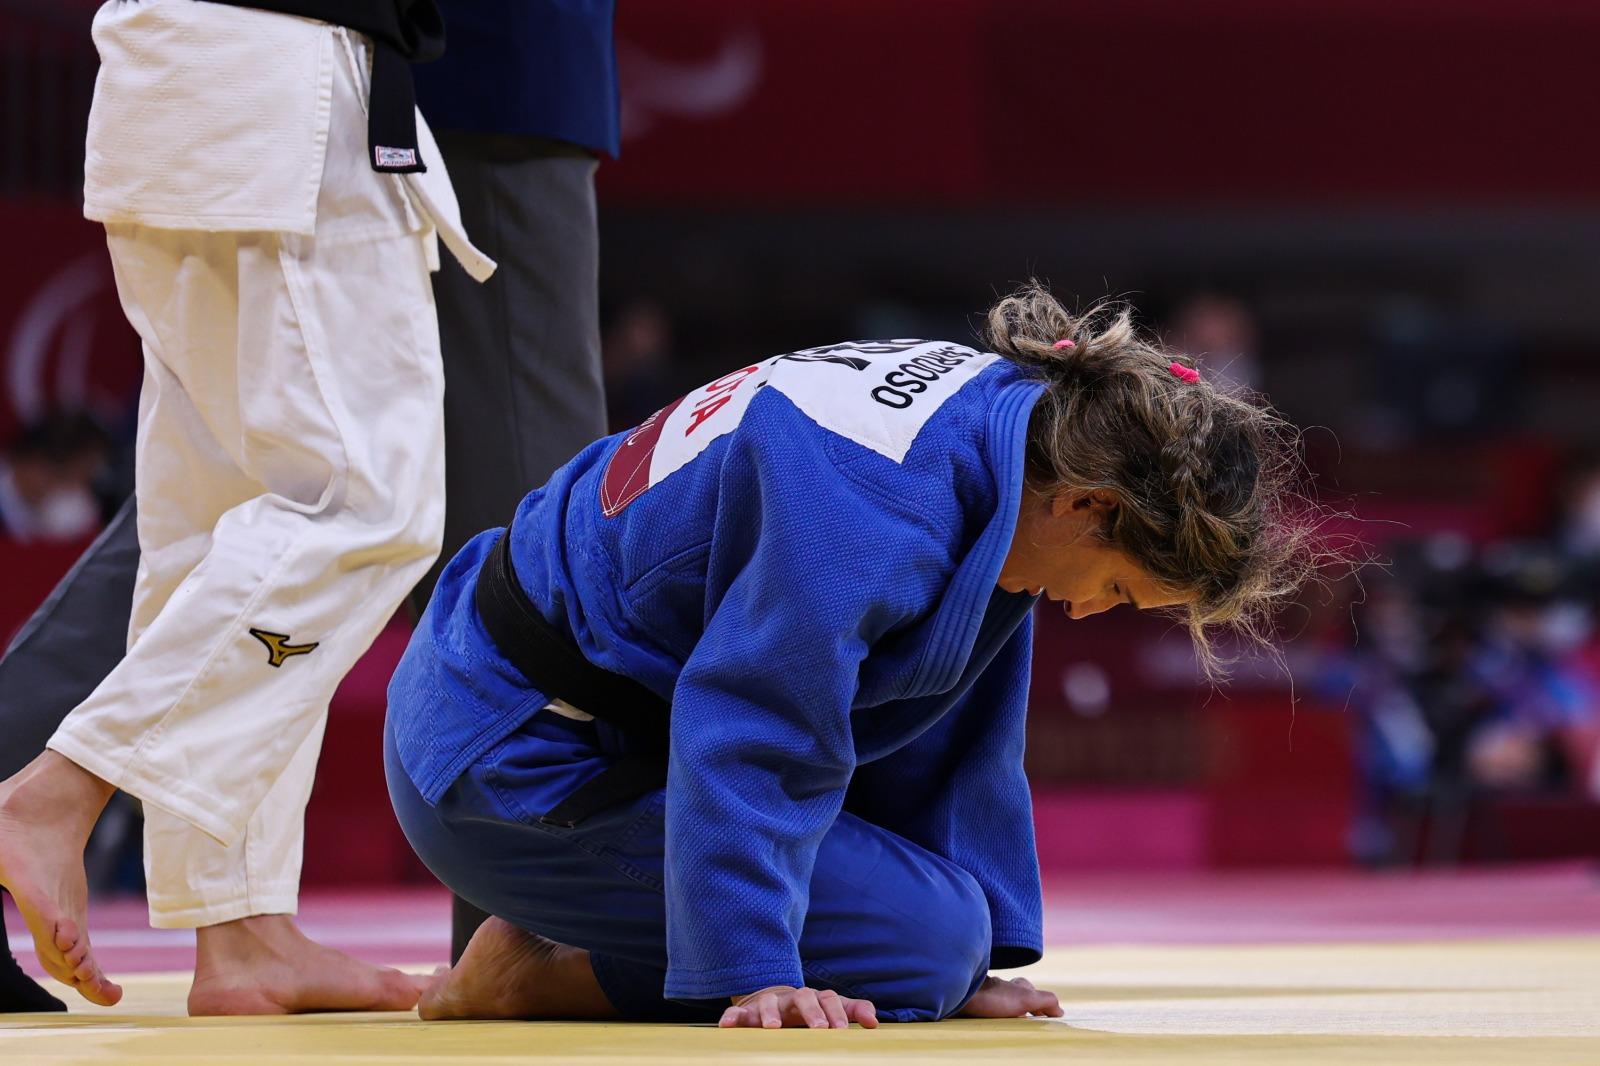 Thiego Marques e Karla Cardoso caem no judô - Olimpia Sports